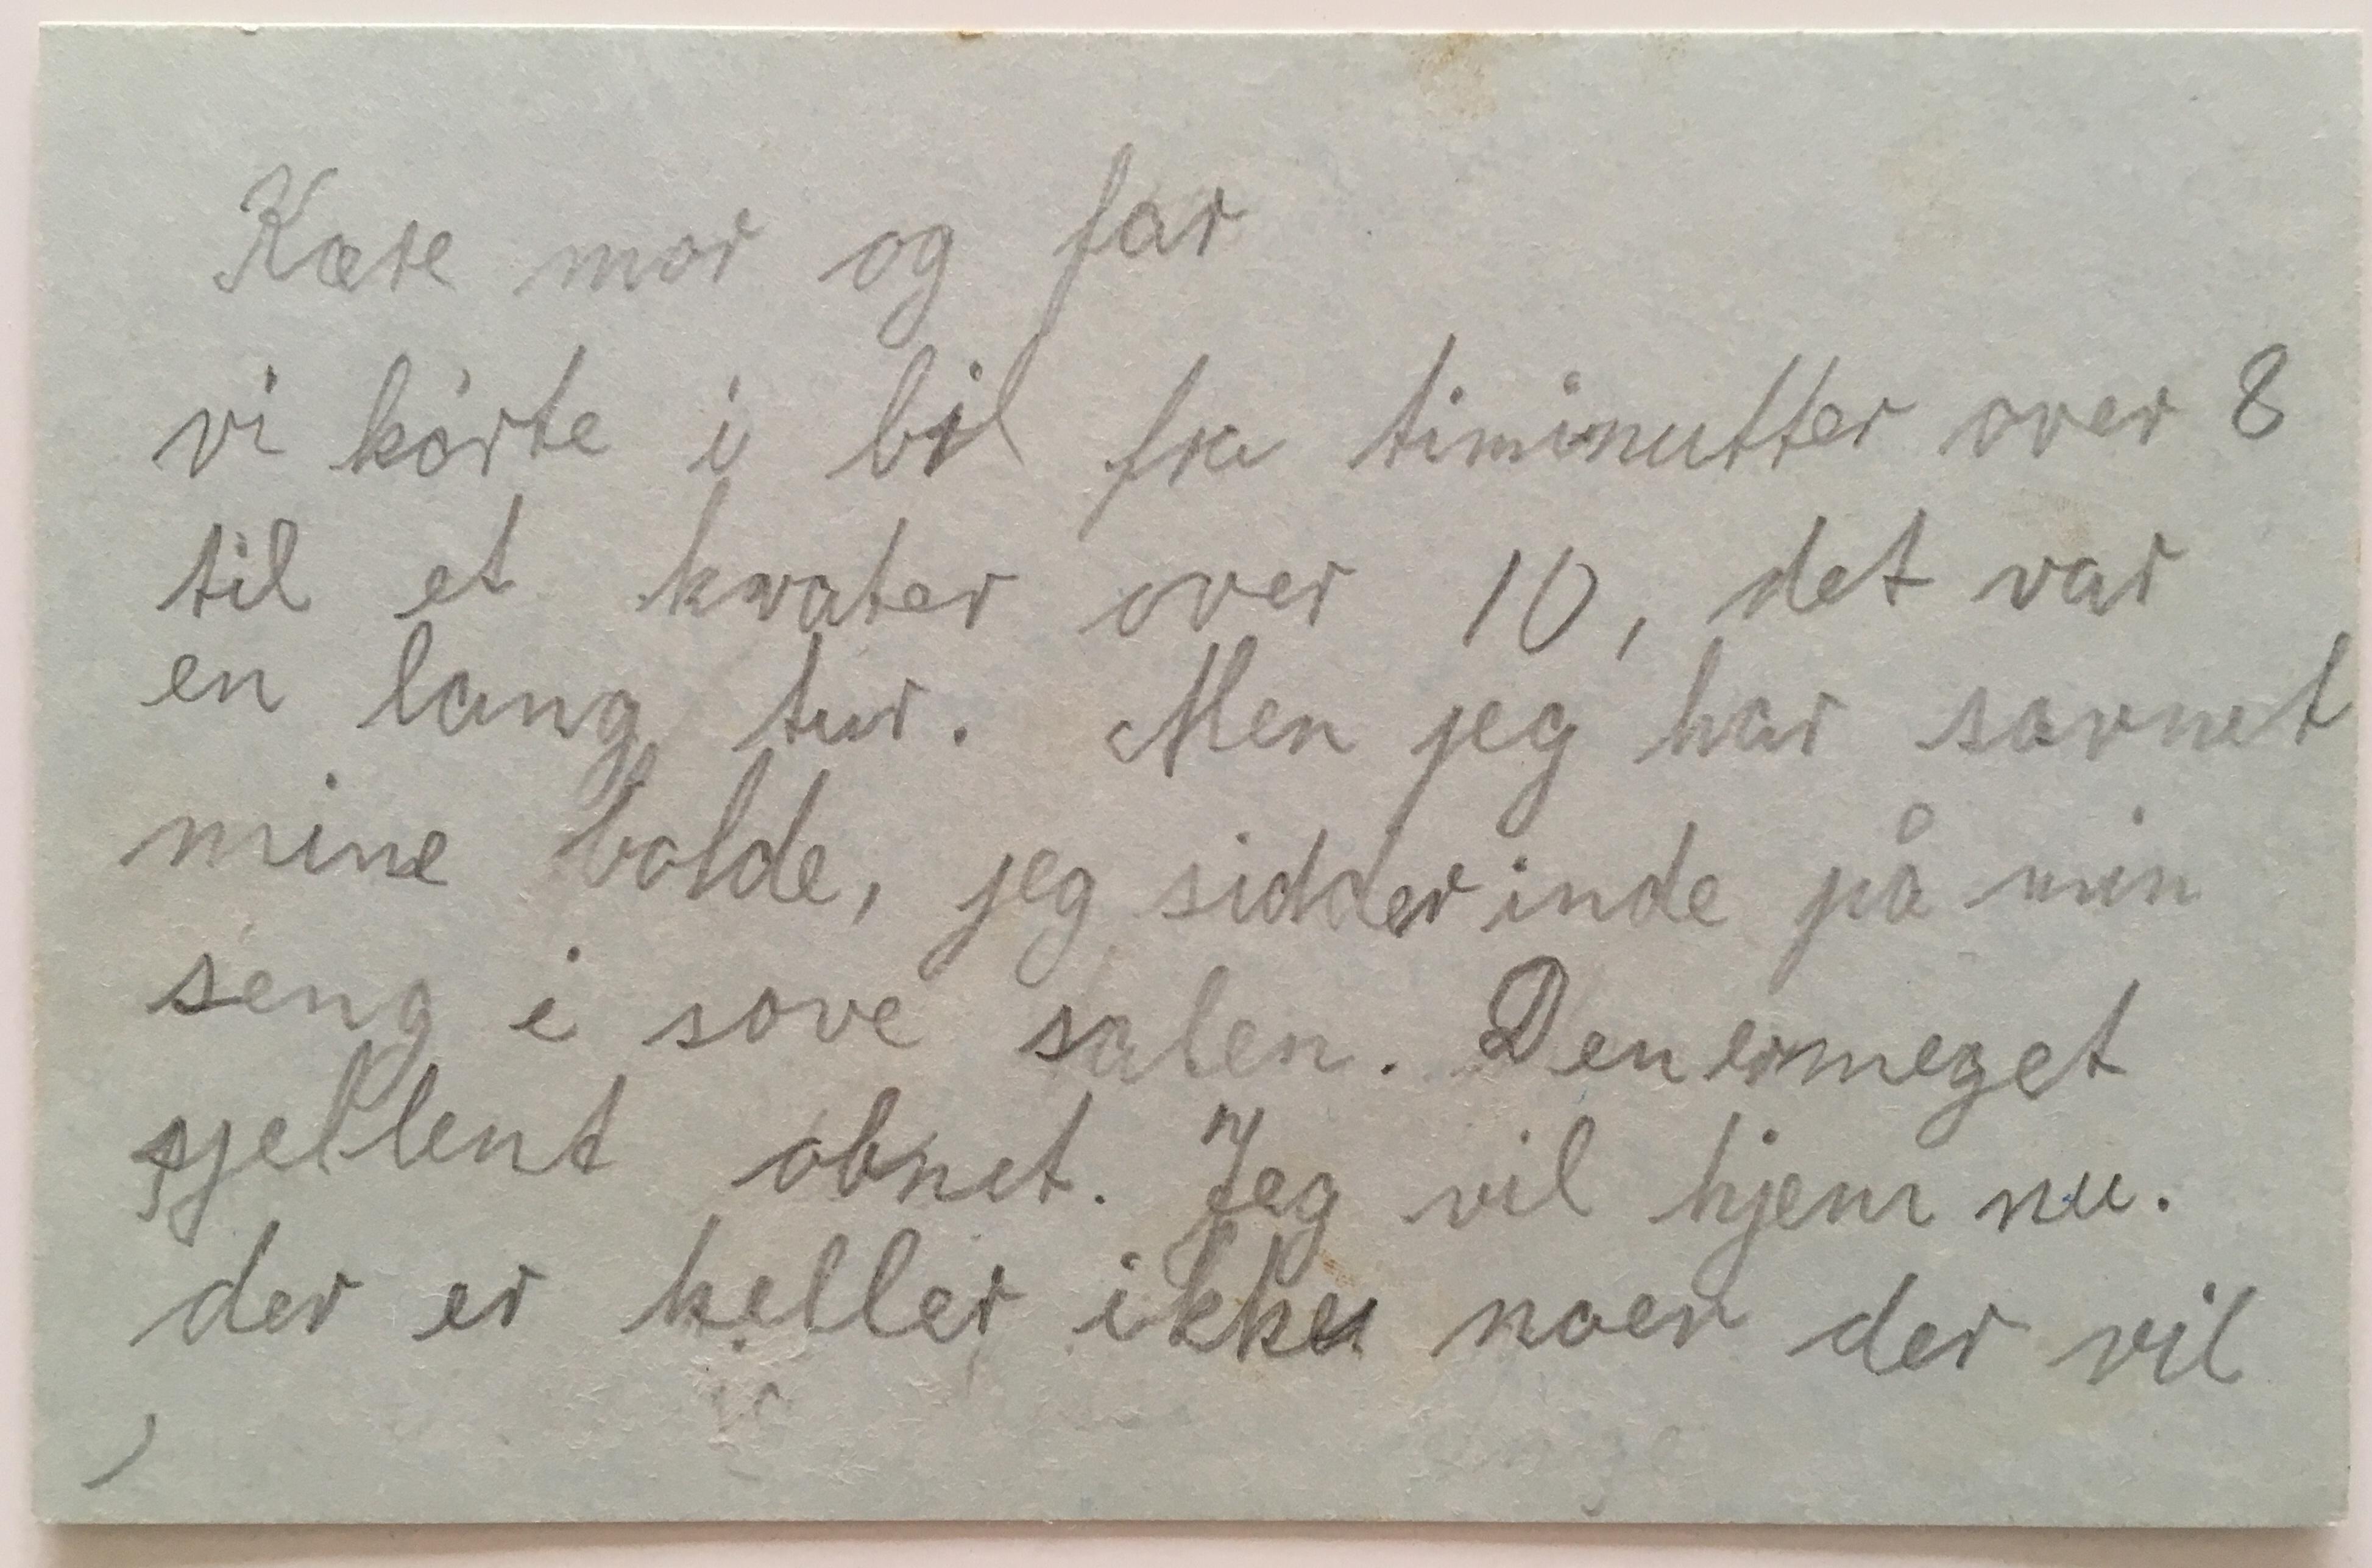 et brev fra mig om den første dag #1